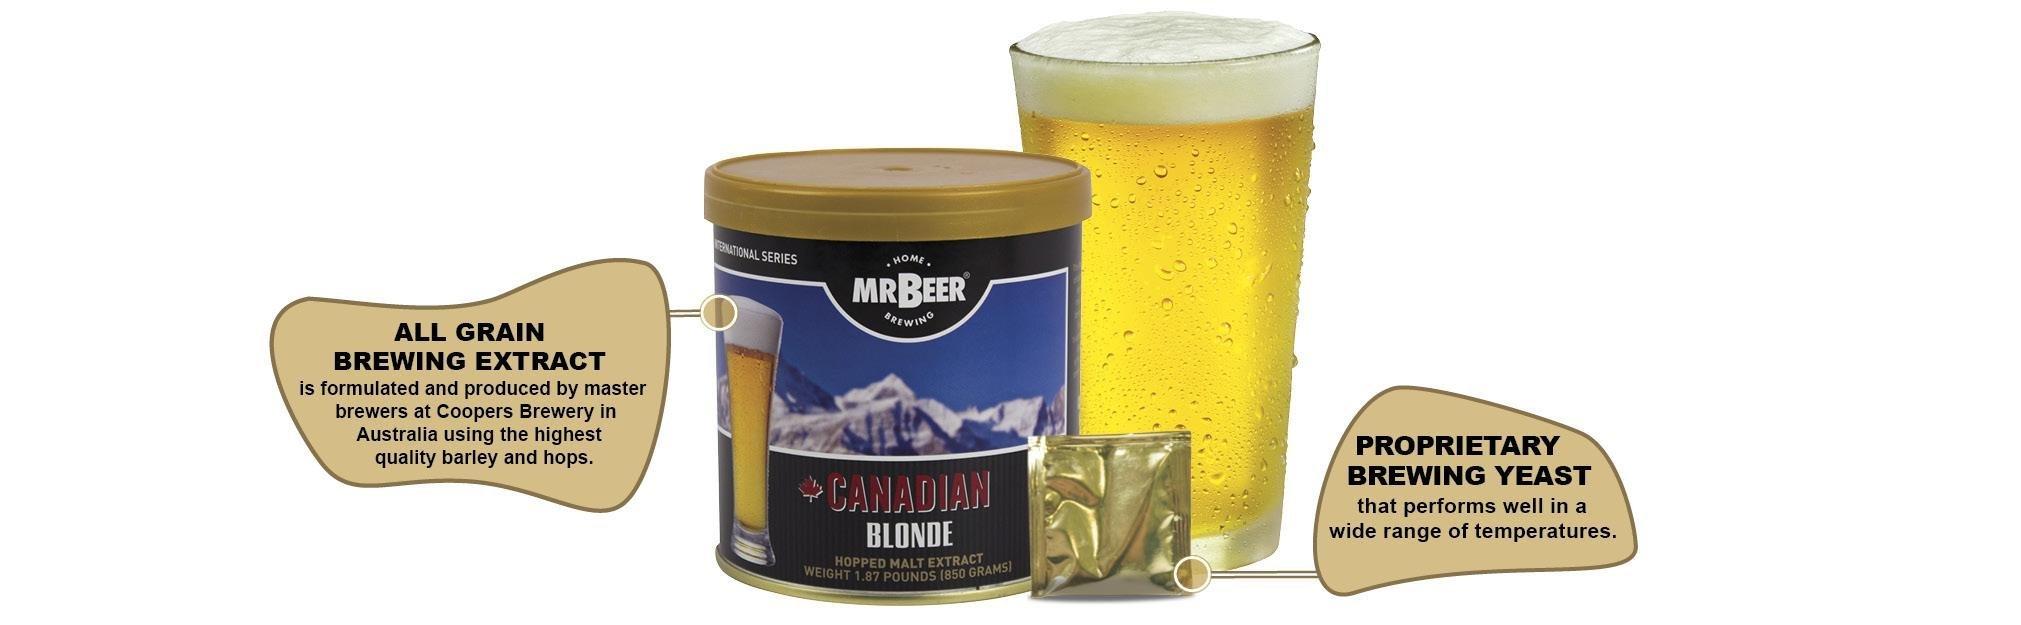 Amazon Craft Beer Kit